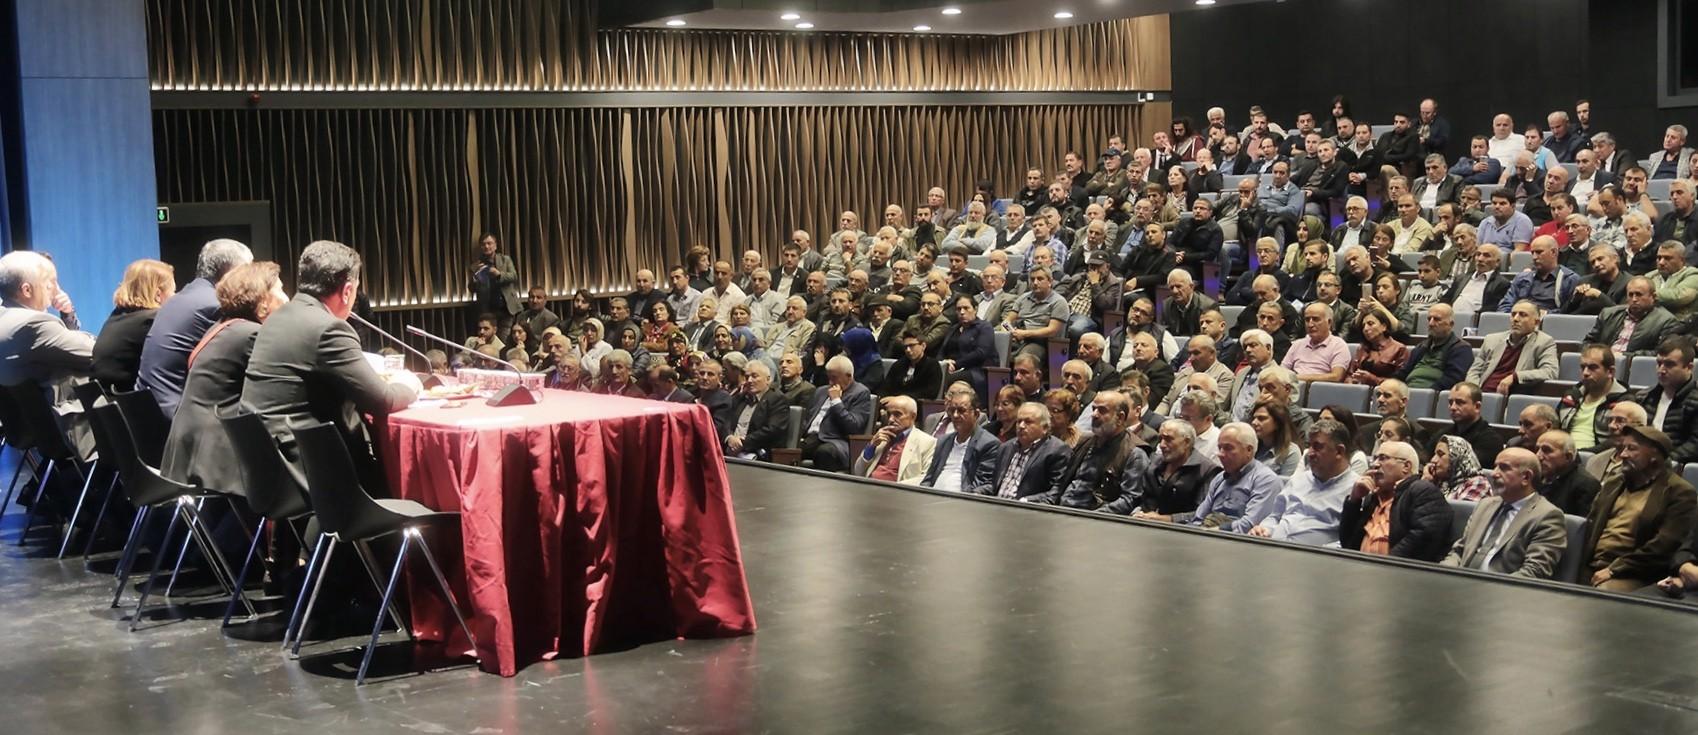 PINAR MAHALLESİ'NİN KADERİ İBB'YE BAĞLI